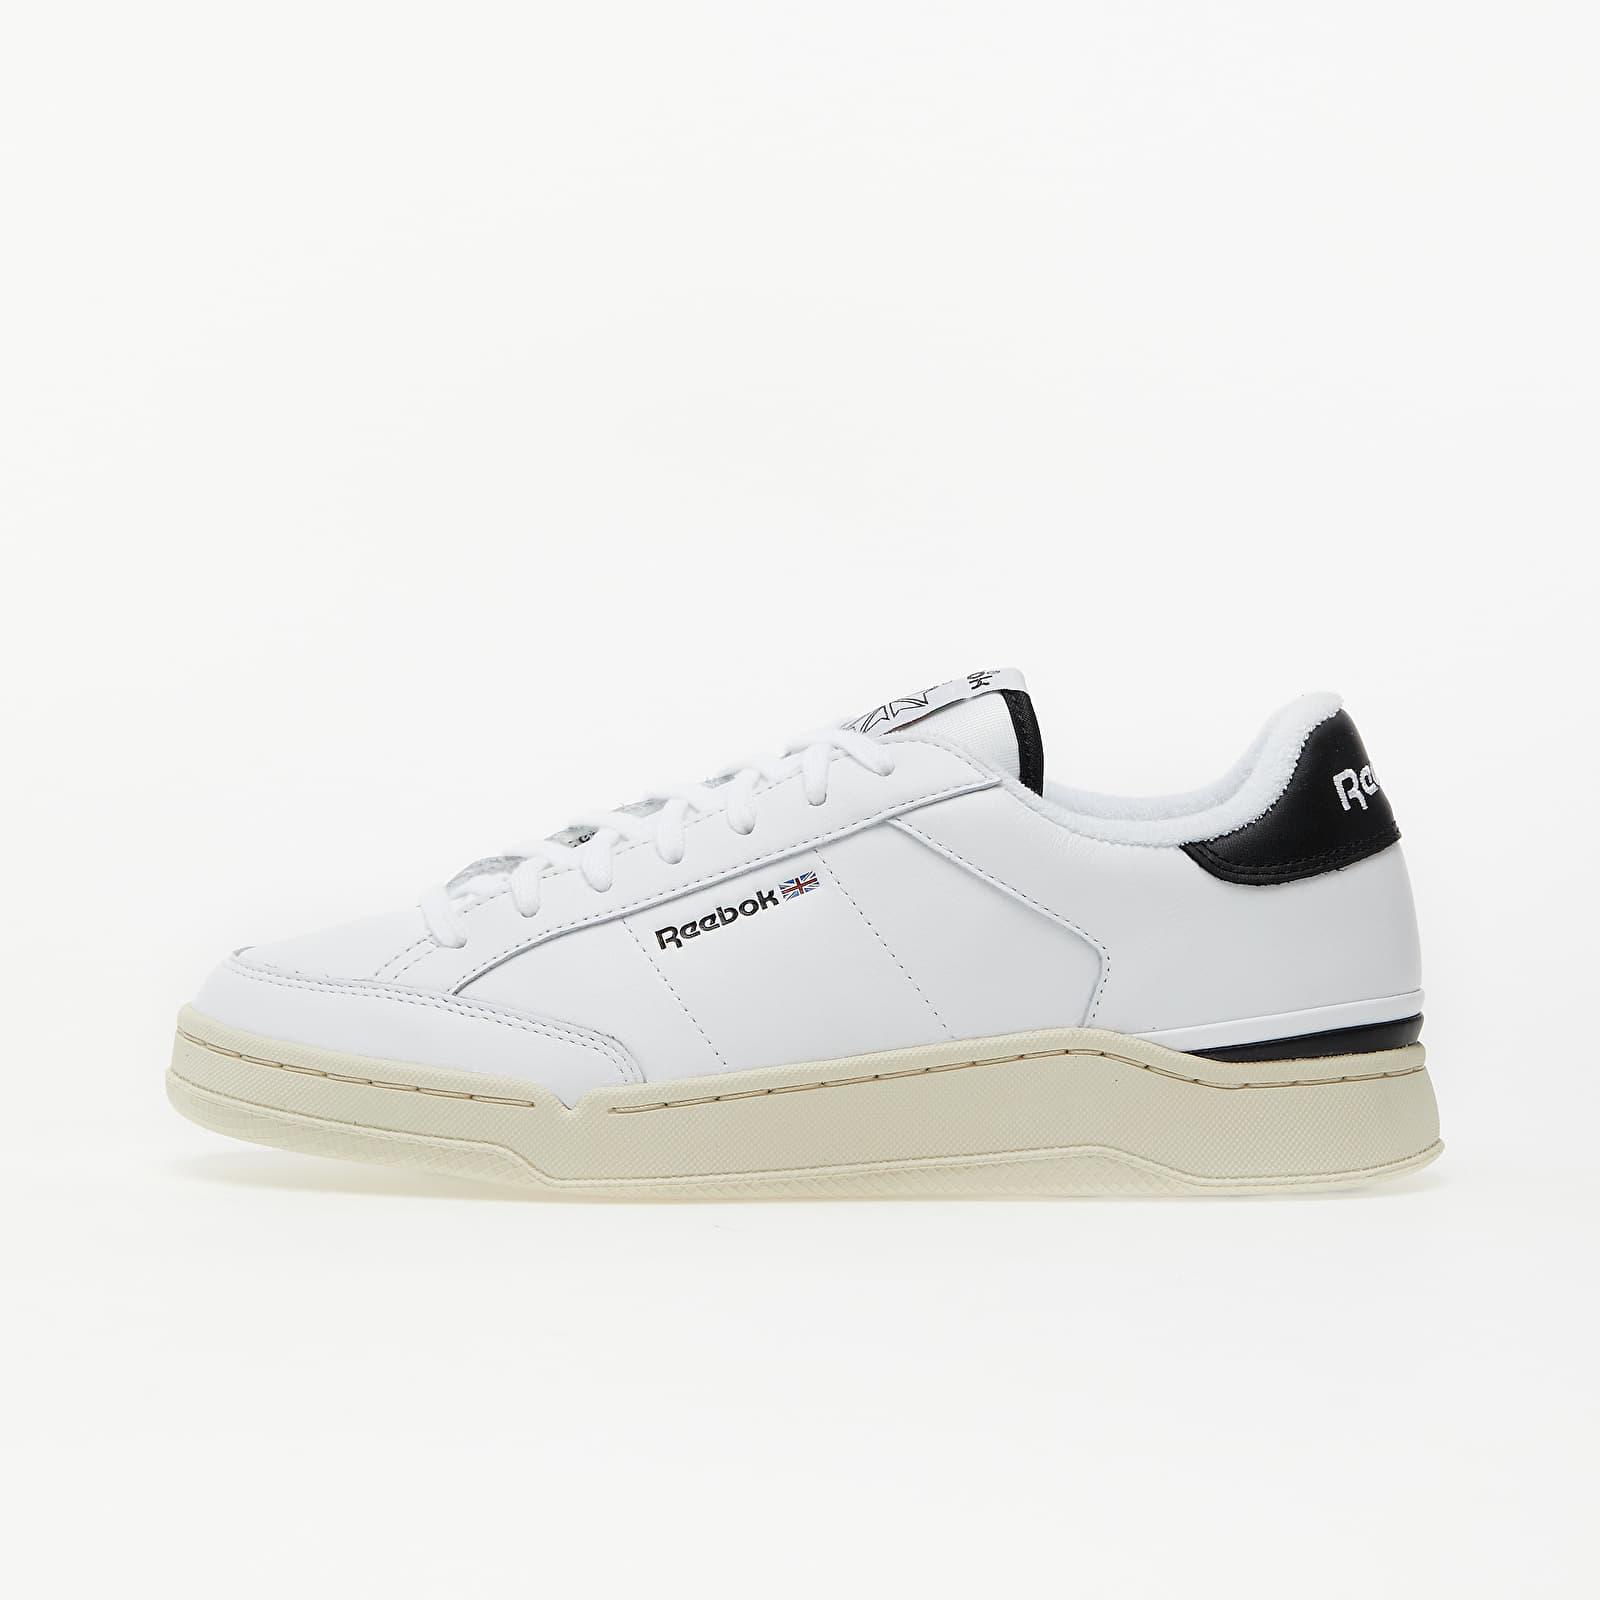 Reebok AD Court Ftwr White/ Core Black/ White EUR 45